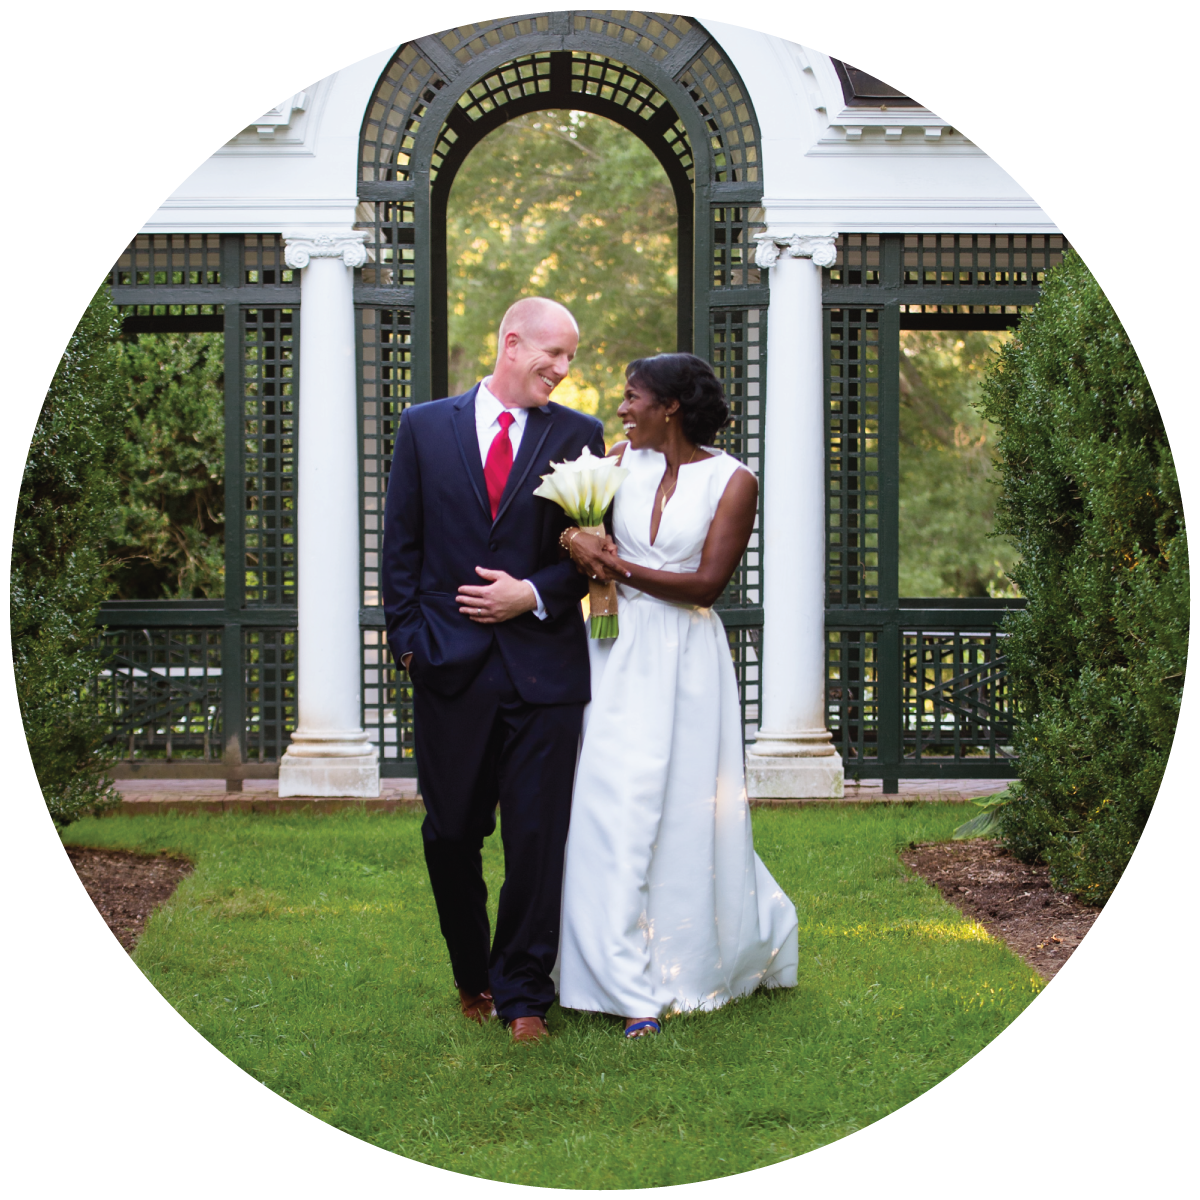 Lock and Co. Traci JD Medlock Washington DC Wedding Portrait Music Photography Videography Lifestyle Photographers Virginia Taneshia